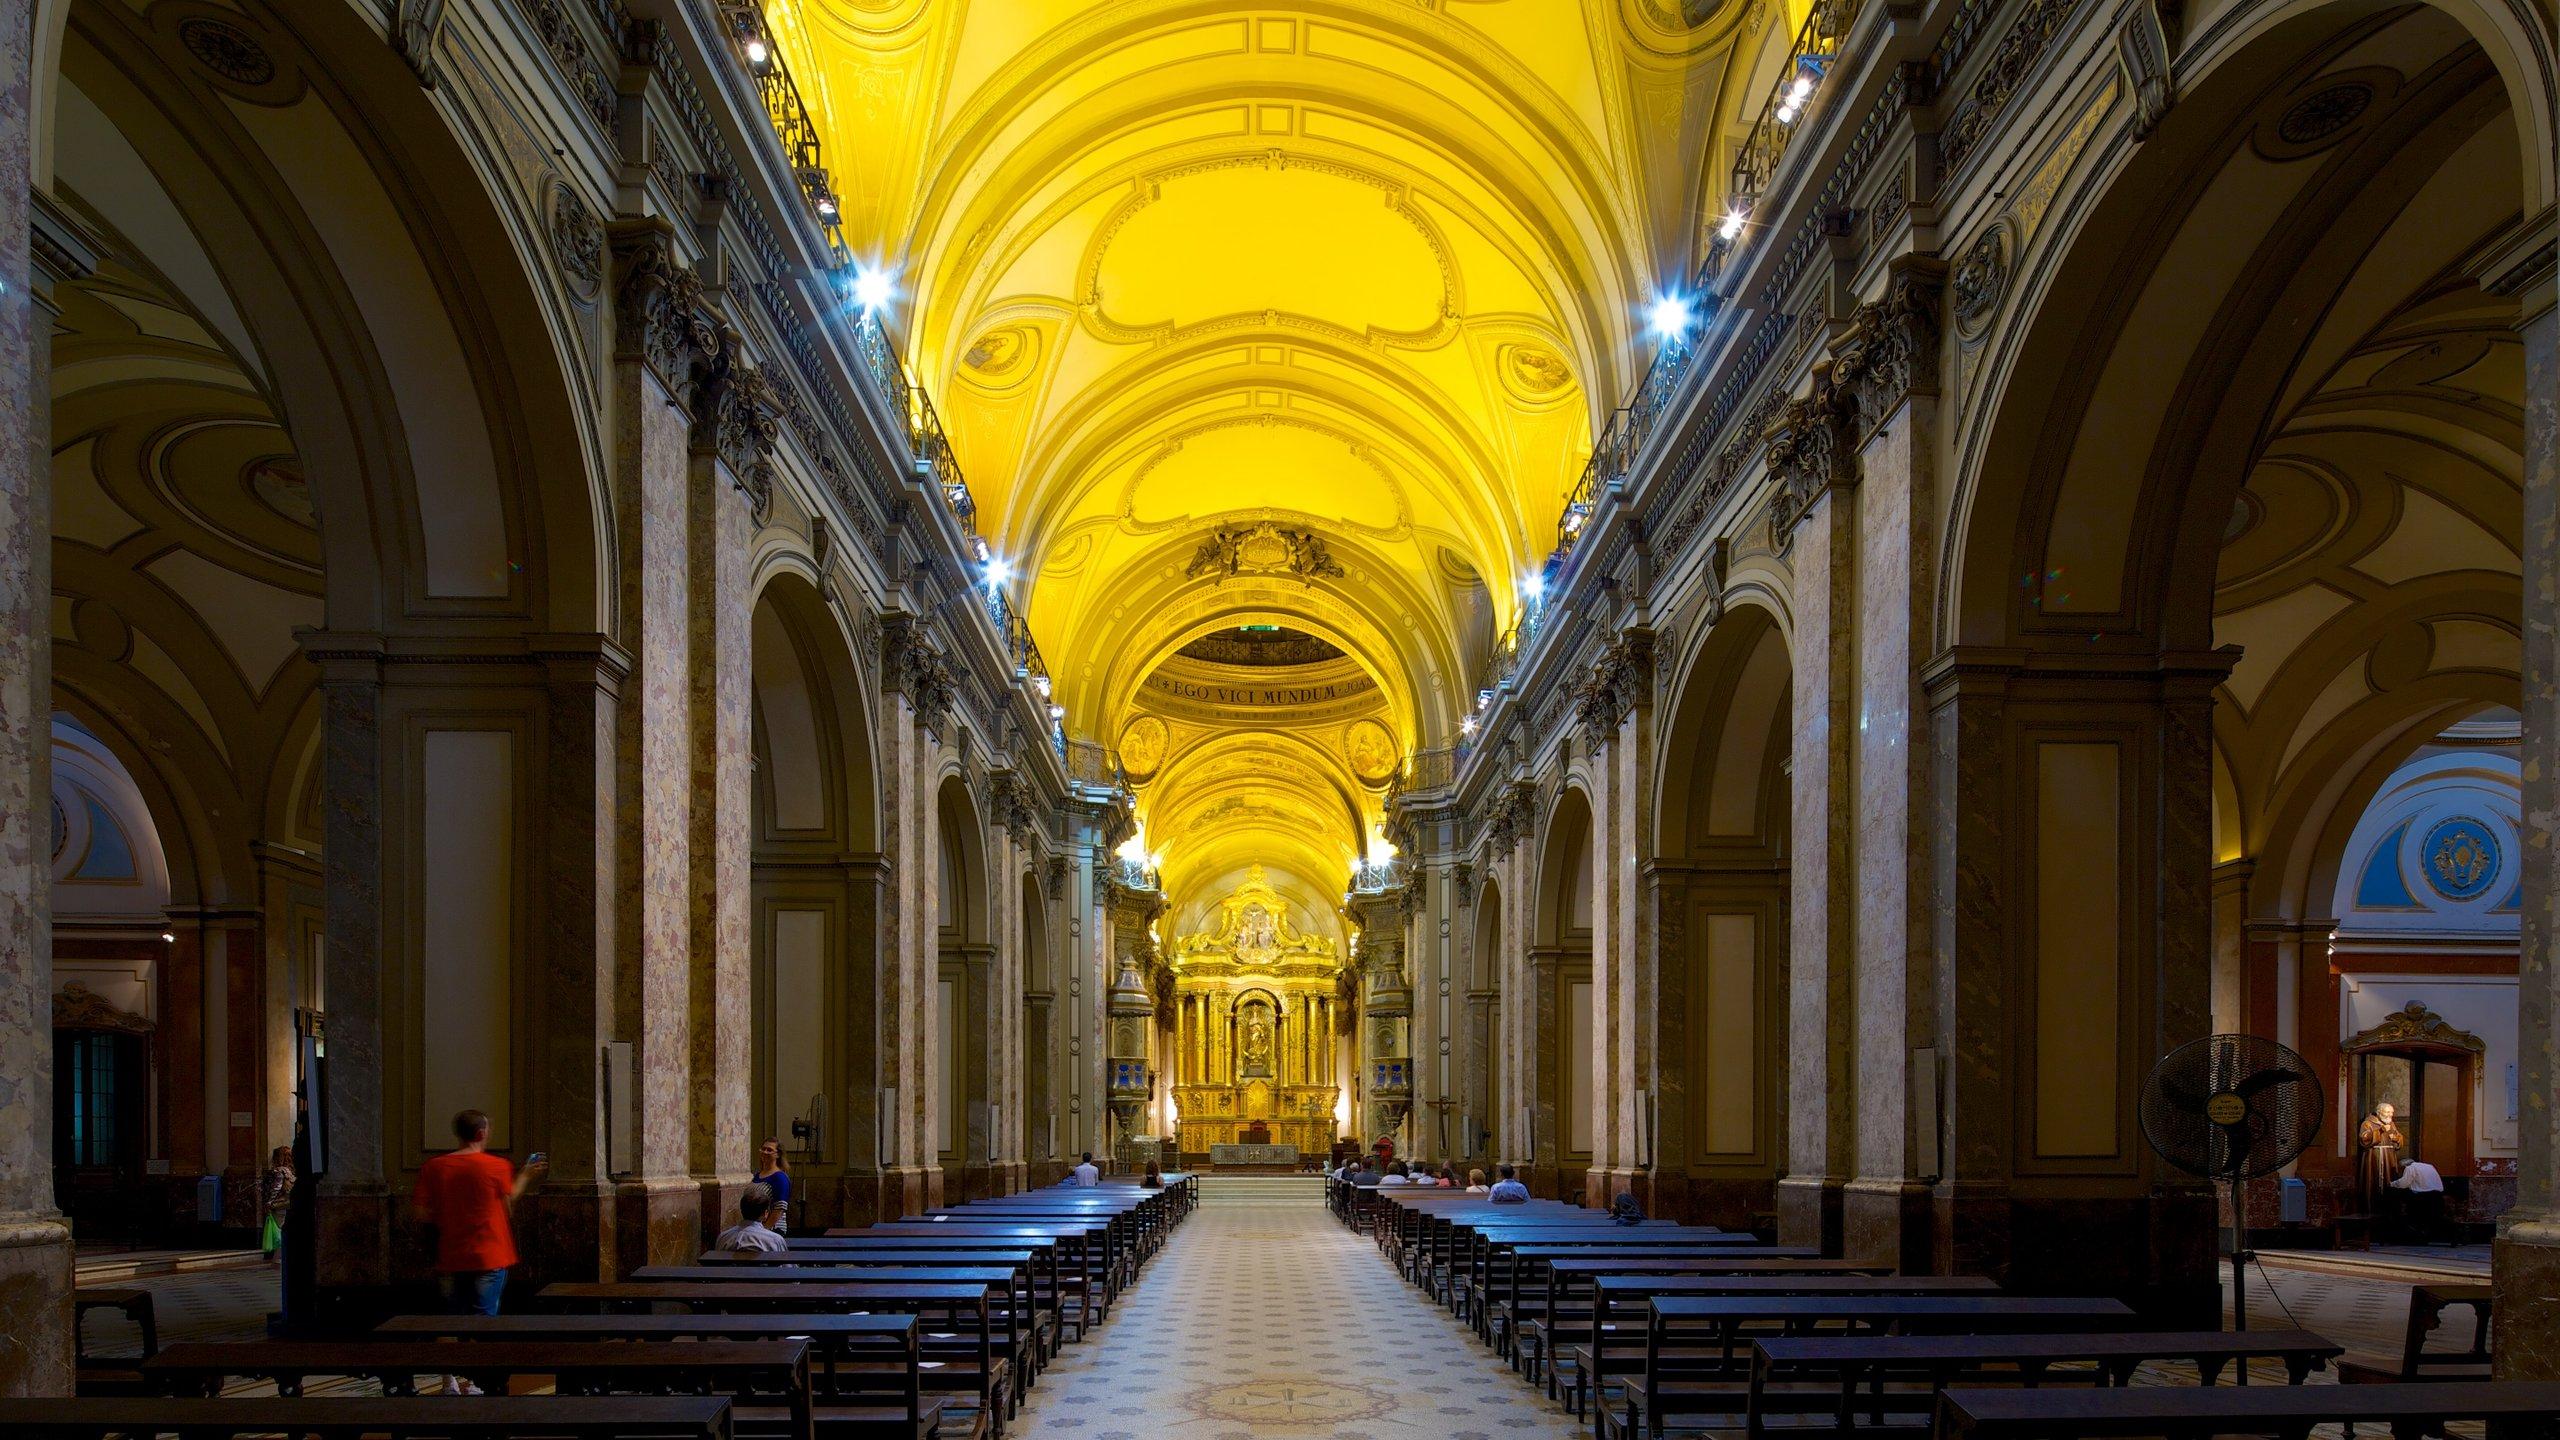 Catedral Metropolitana de Buenos Aires (Kirche), Buenos Aires, Argentinien